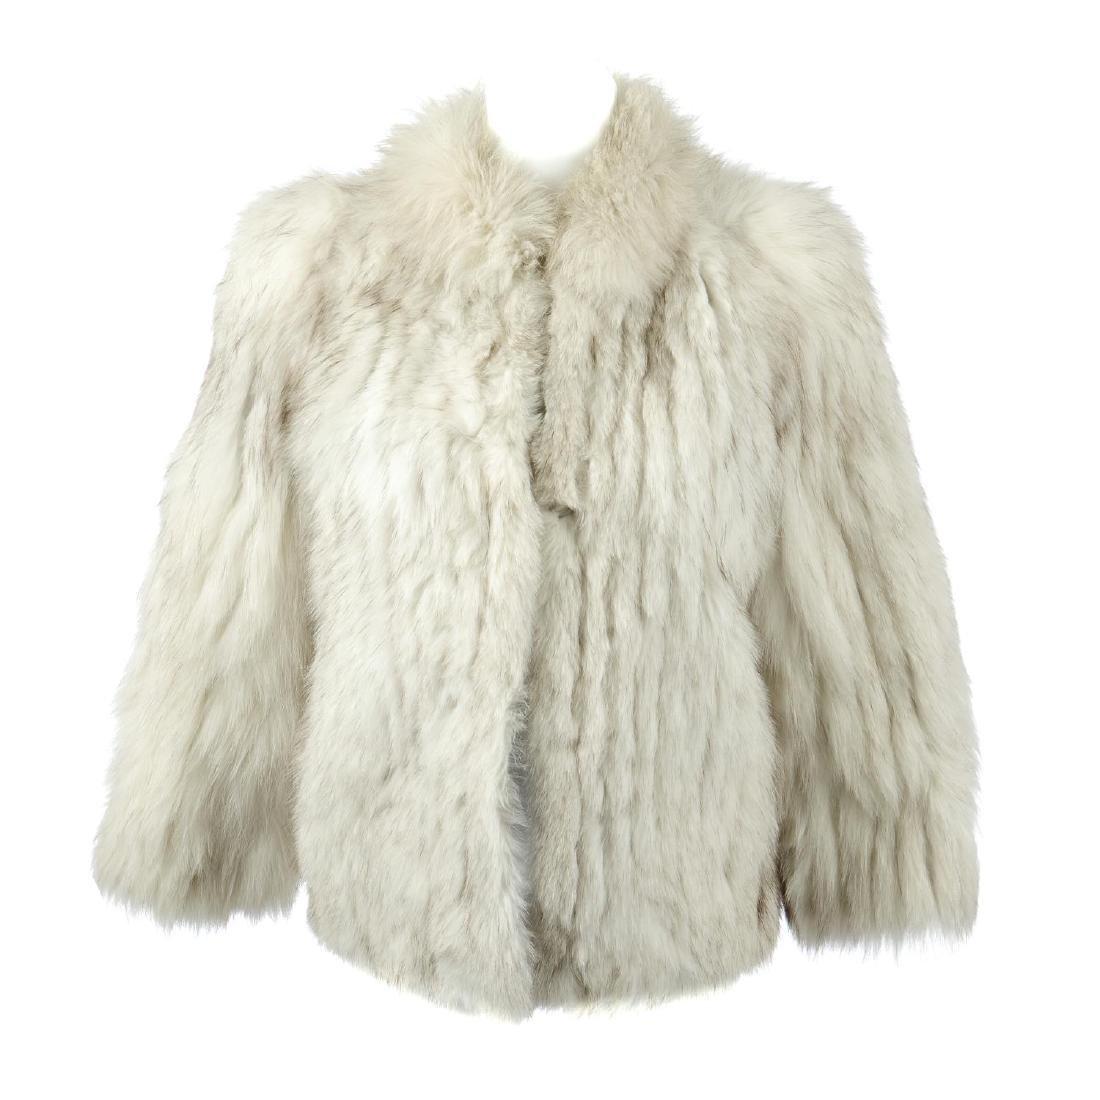 A pieced blue fox fur jacket. Designed with a short